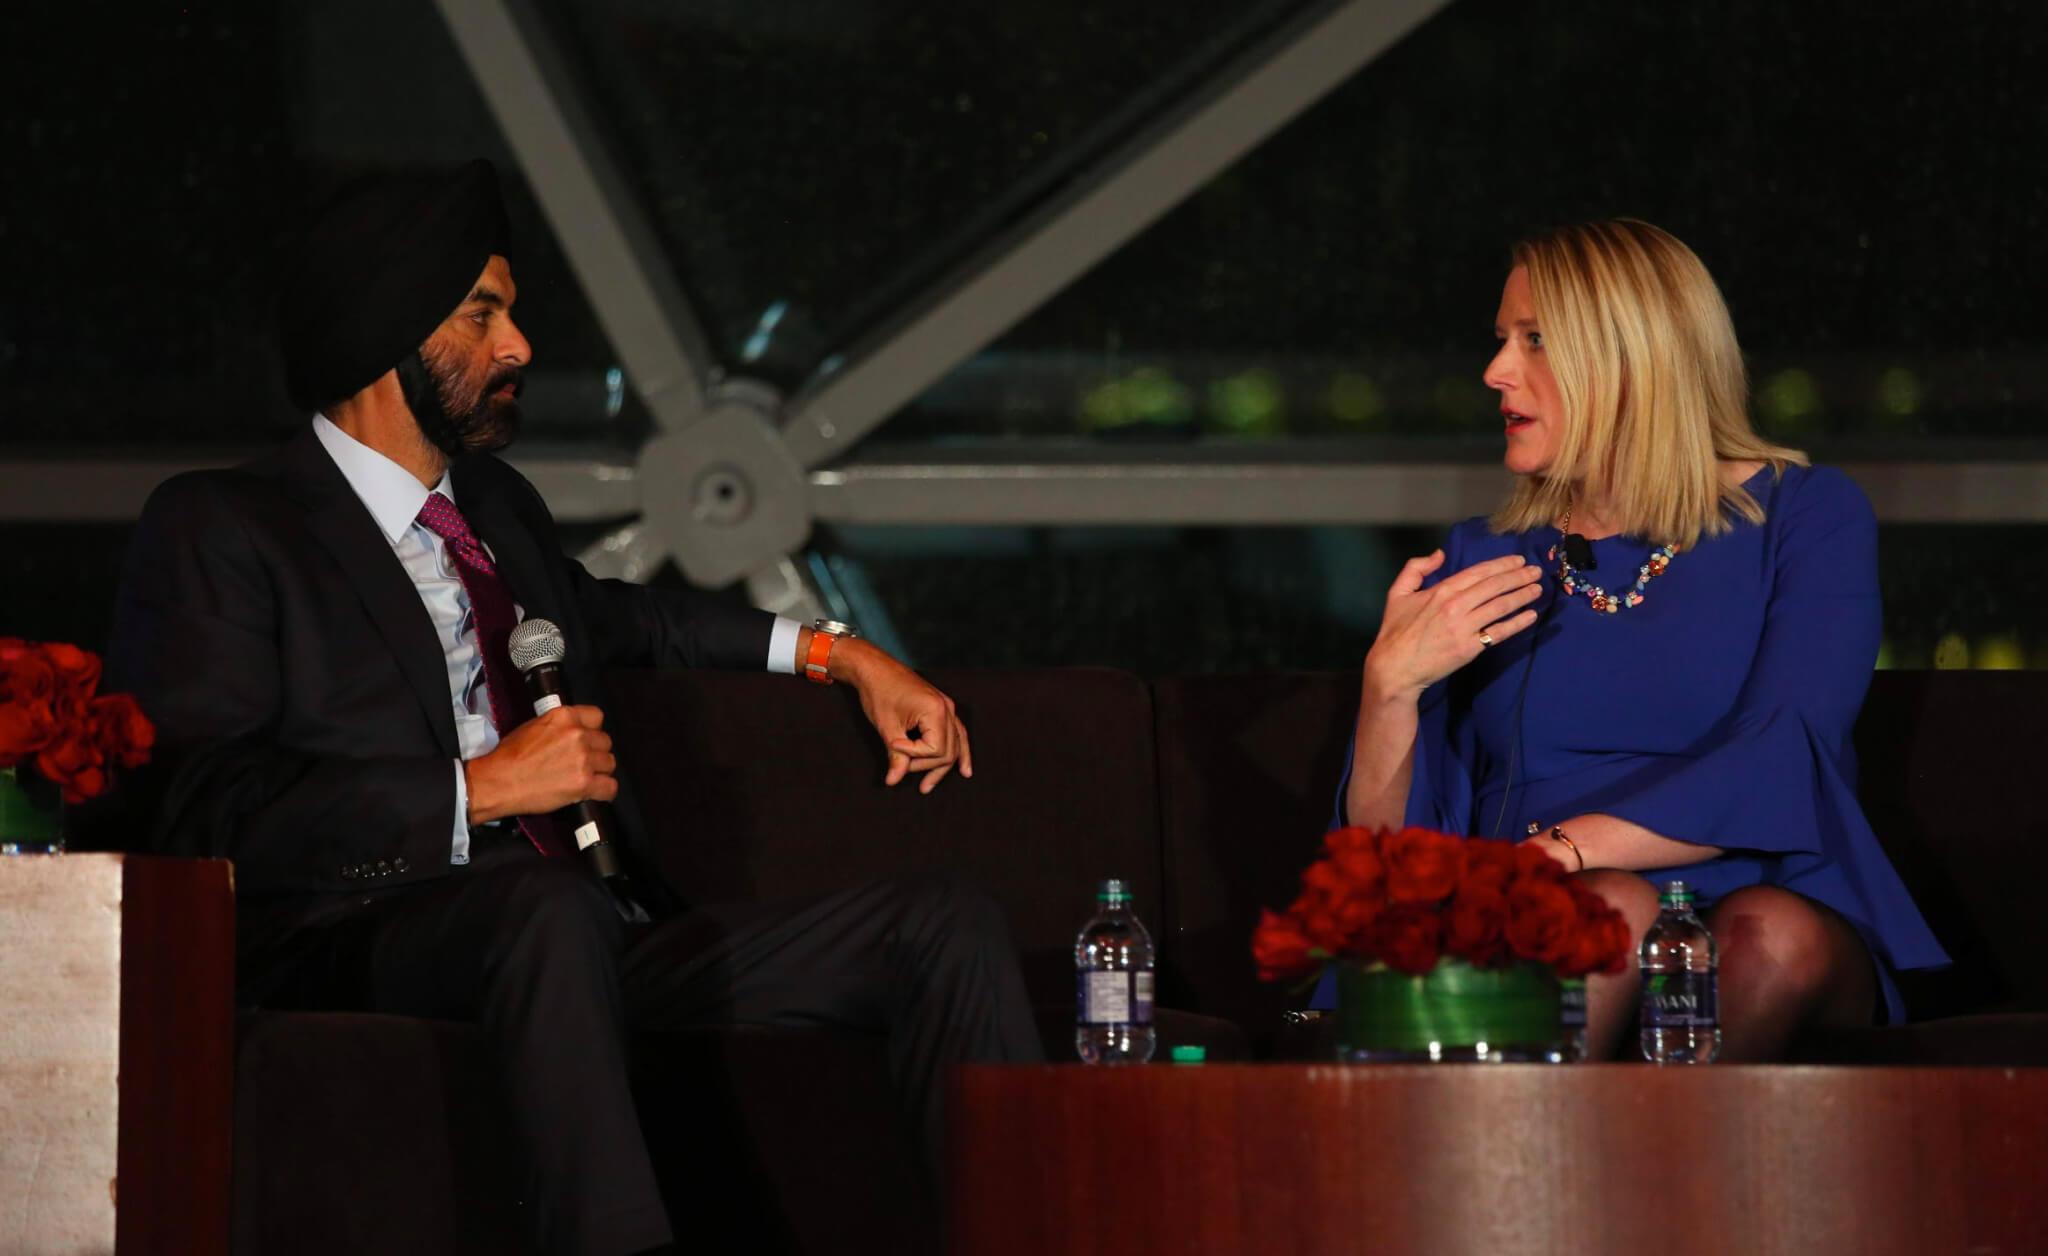 Mastercard CEO Ajay Banga and Chief Trade Commissioner of Canada Ailish Cambell